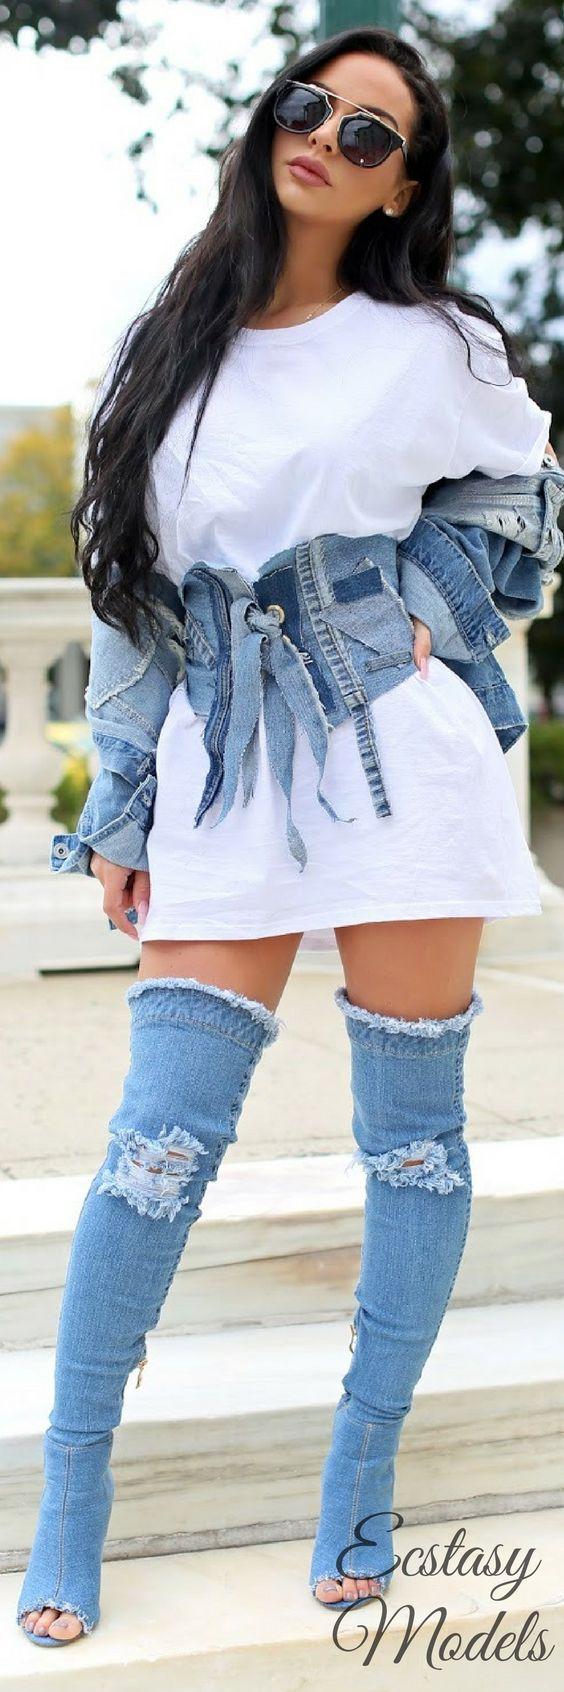 27++ Denim on denim outfit ideas info